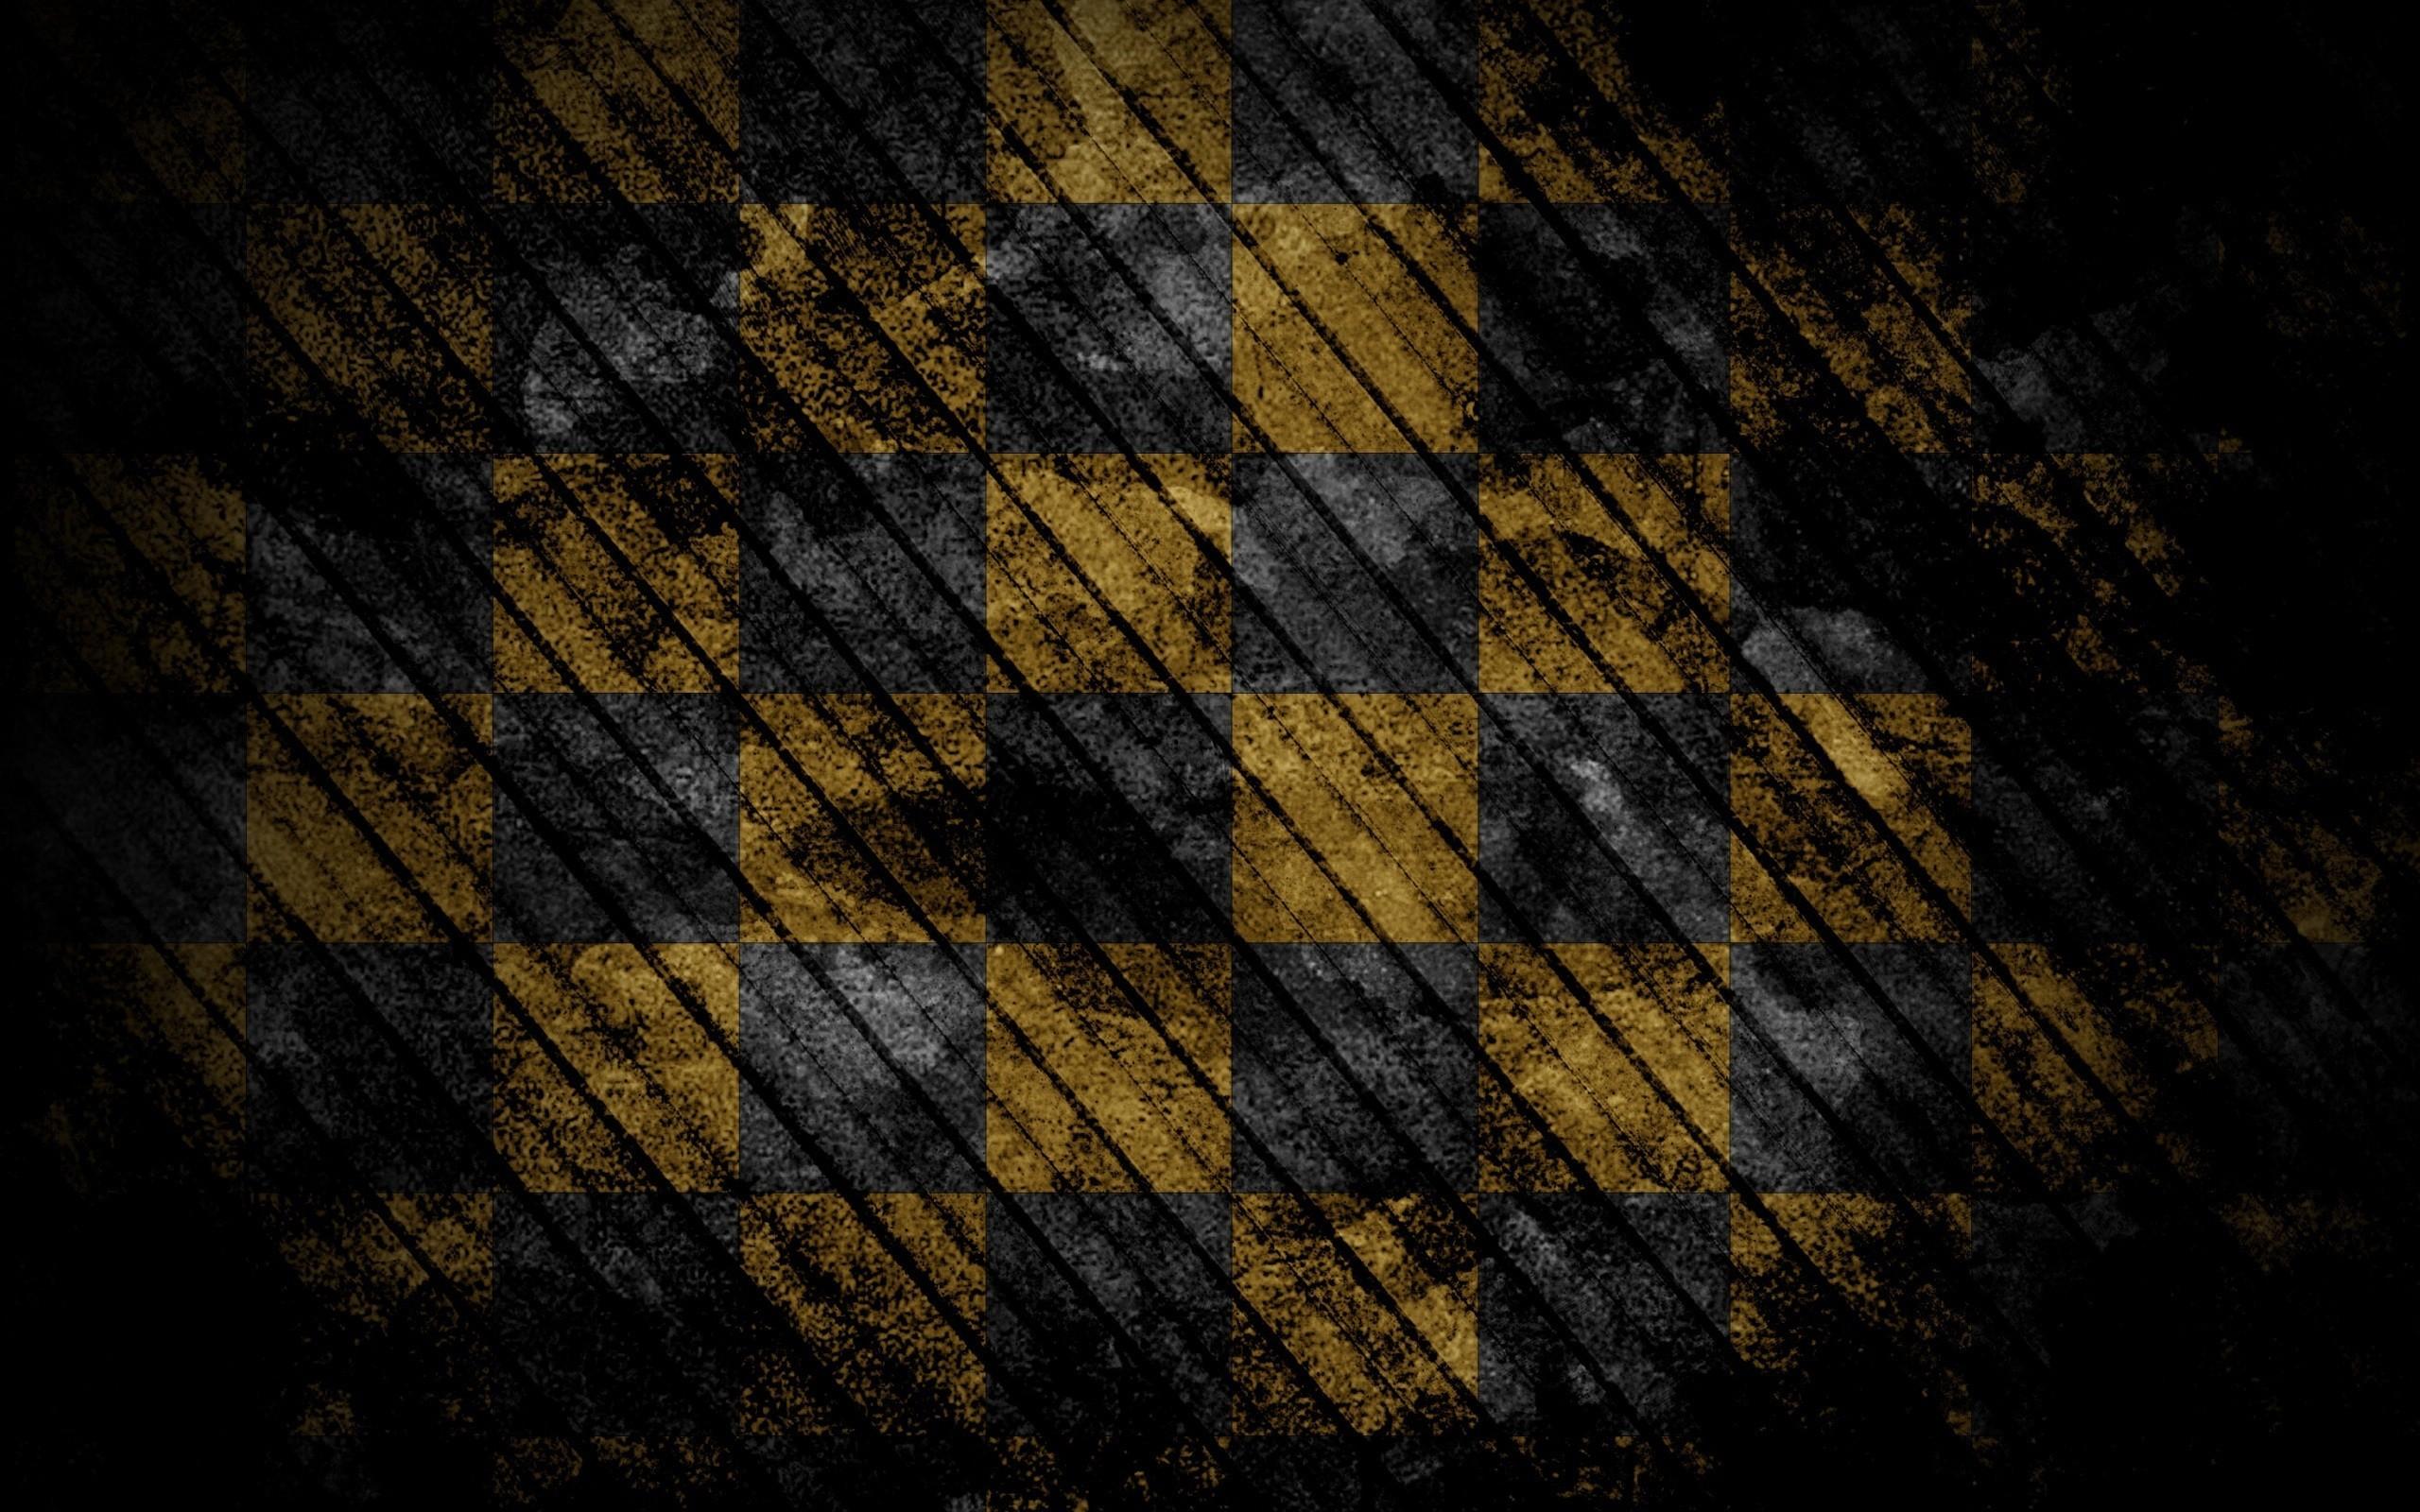 Grunge Abstract HD Wallpapers   WallpapersIn4k.net